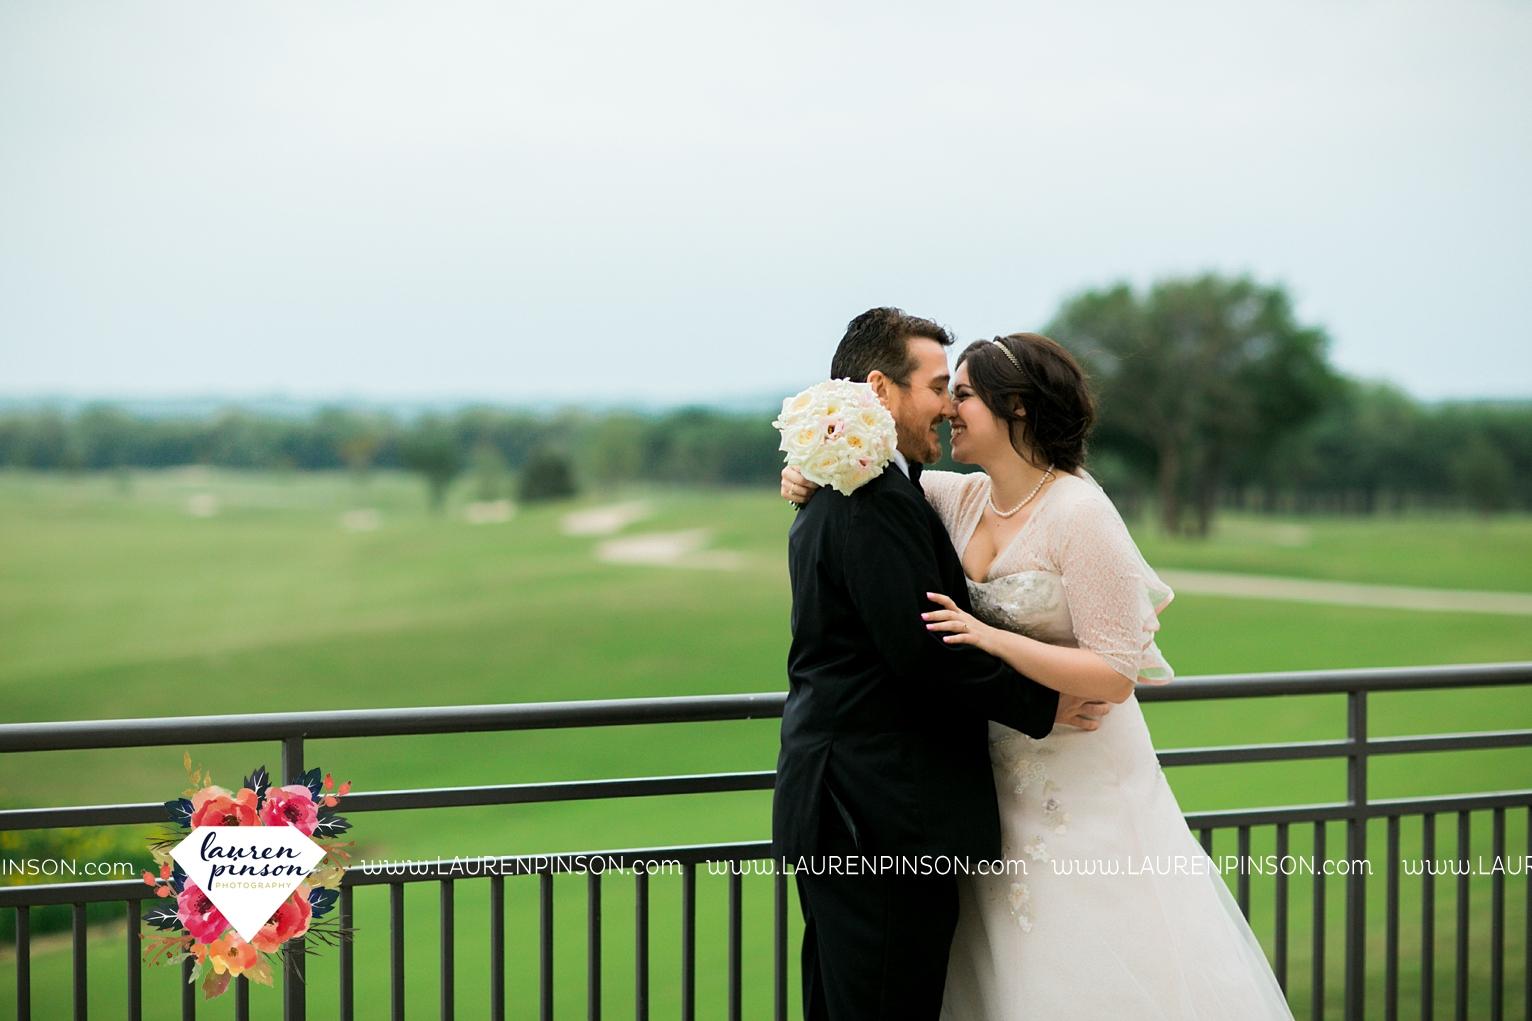 gainesville-texas-sherman-texas-thackerville-oklahoma-wedding-photographer-at-winstar-casino-golf-resort_2290.jpg